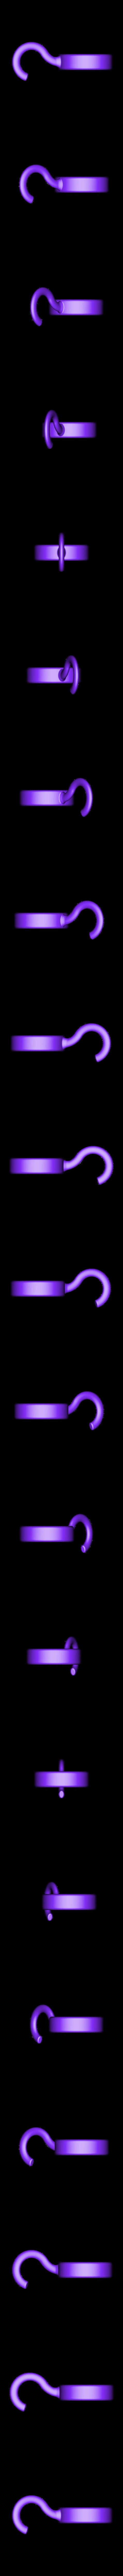 Hook_small_2.STL Download free STL file Hook & Hanger System • 3D printing object, Festus440